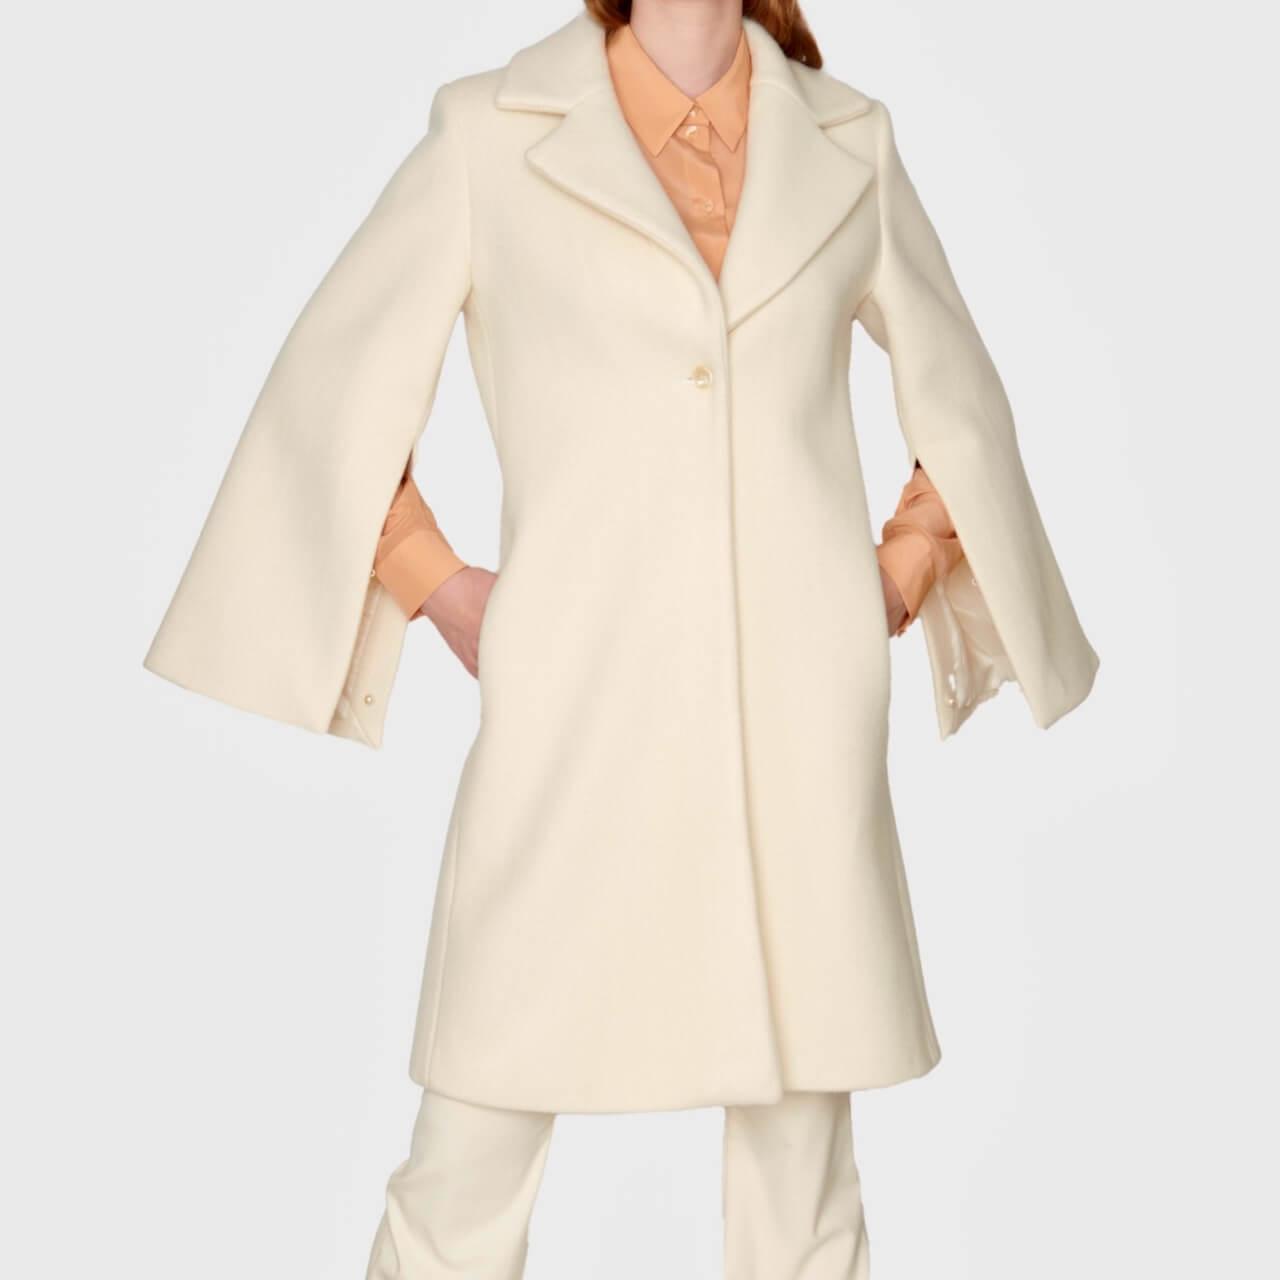 VICTORIA GEISER - Coat KIMONO-CUT Creme - 749 €